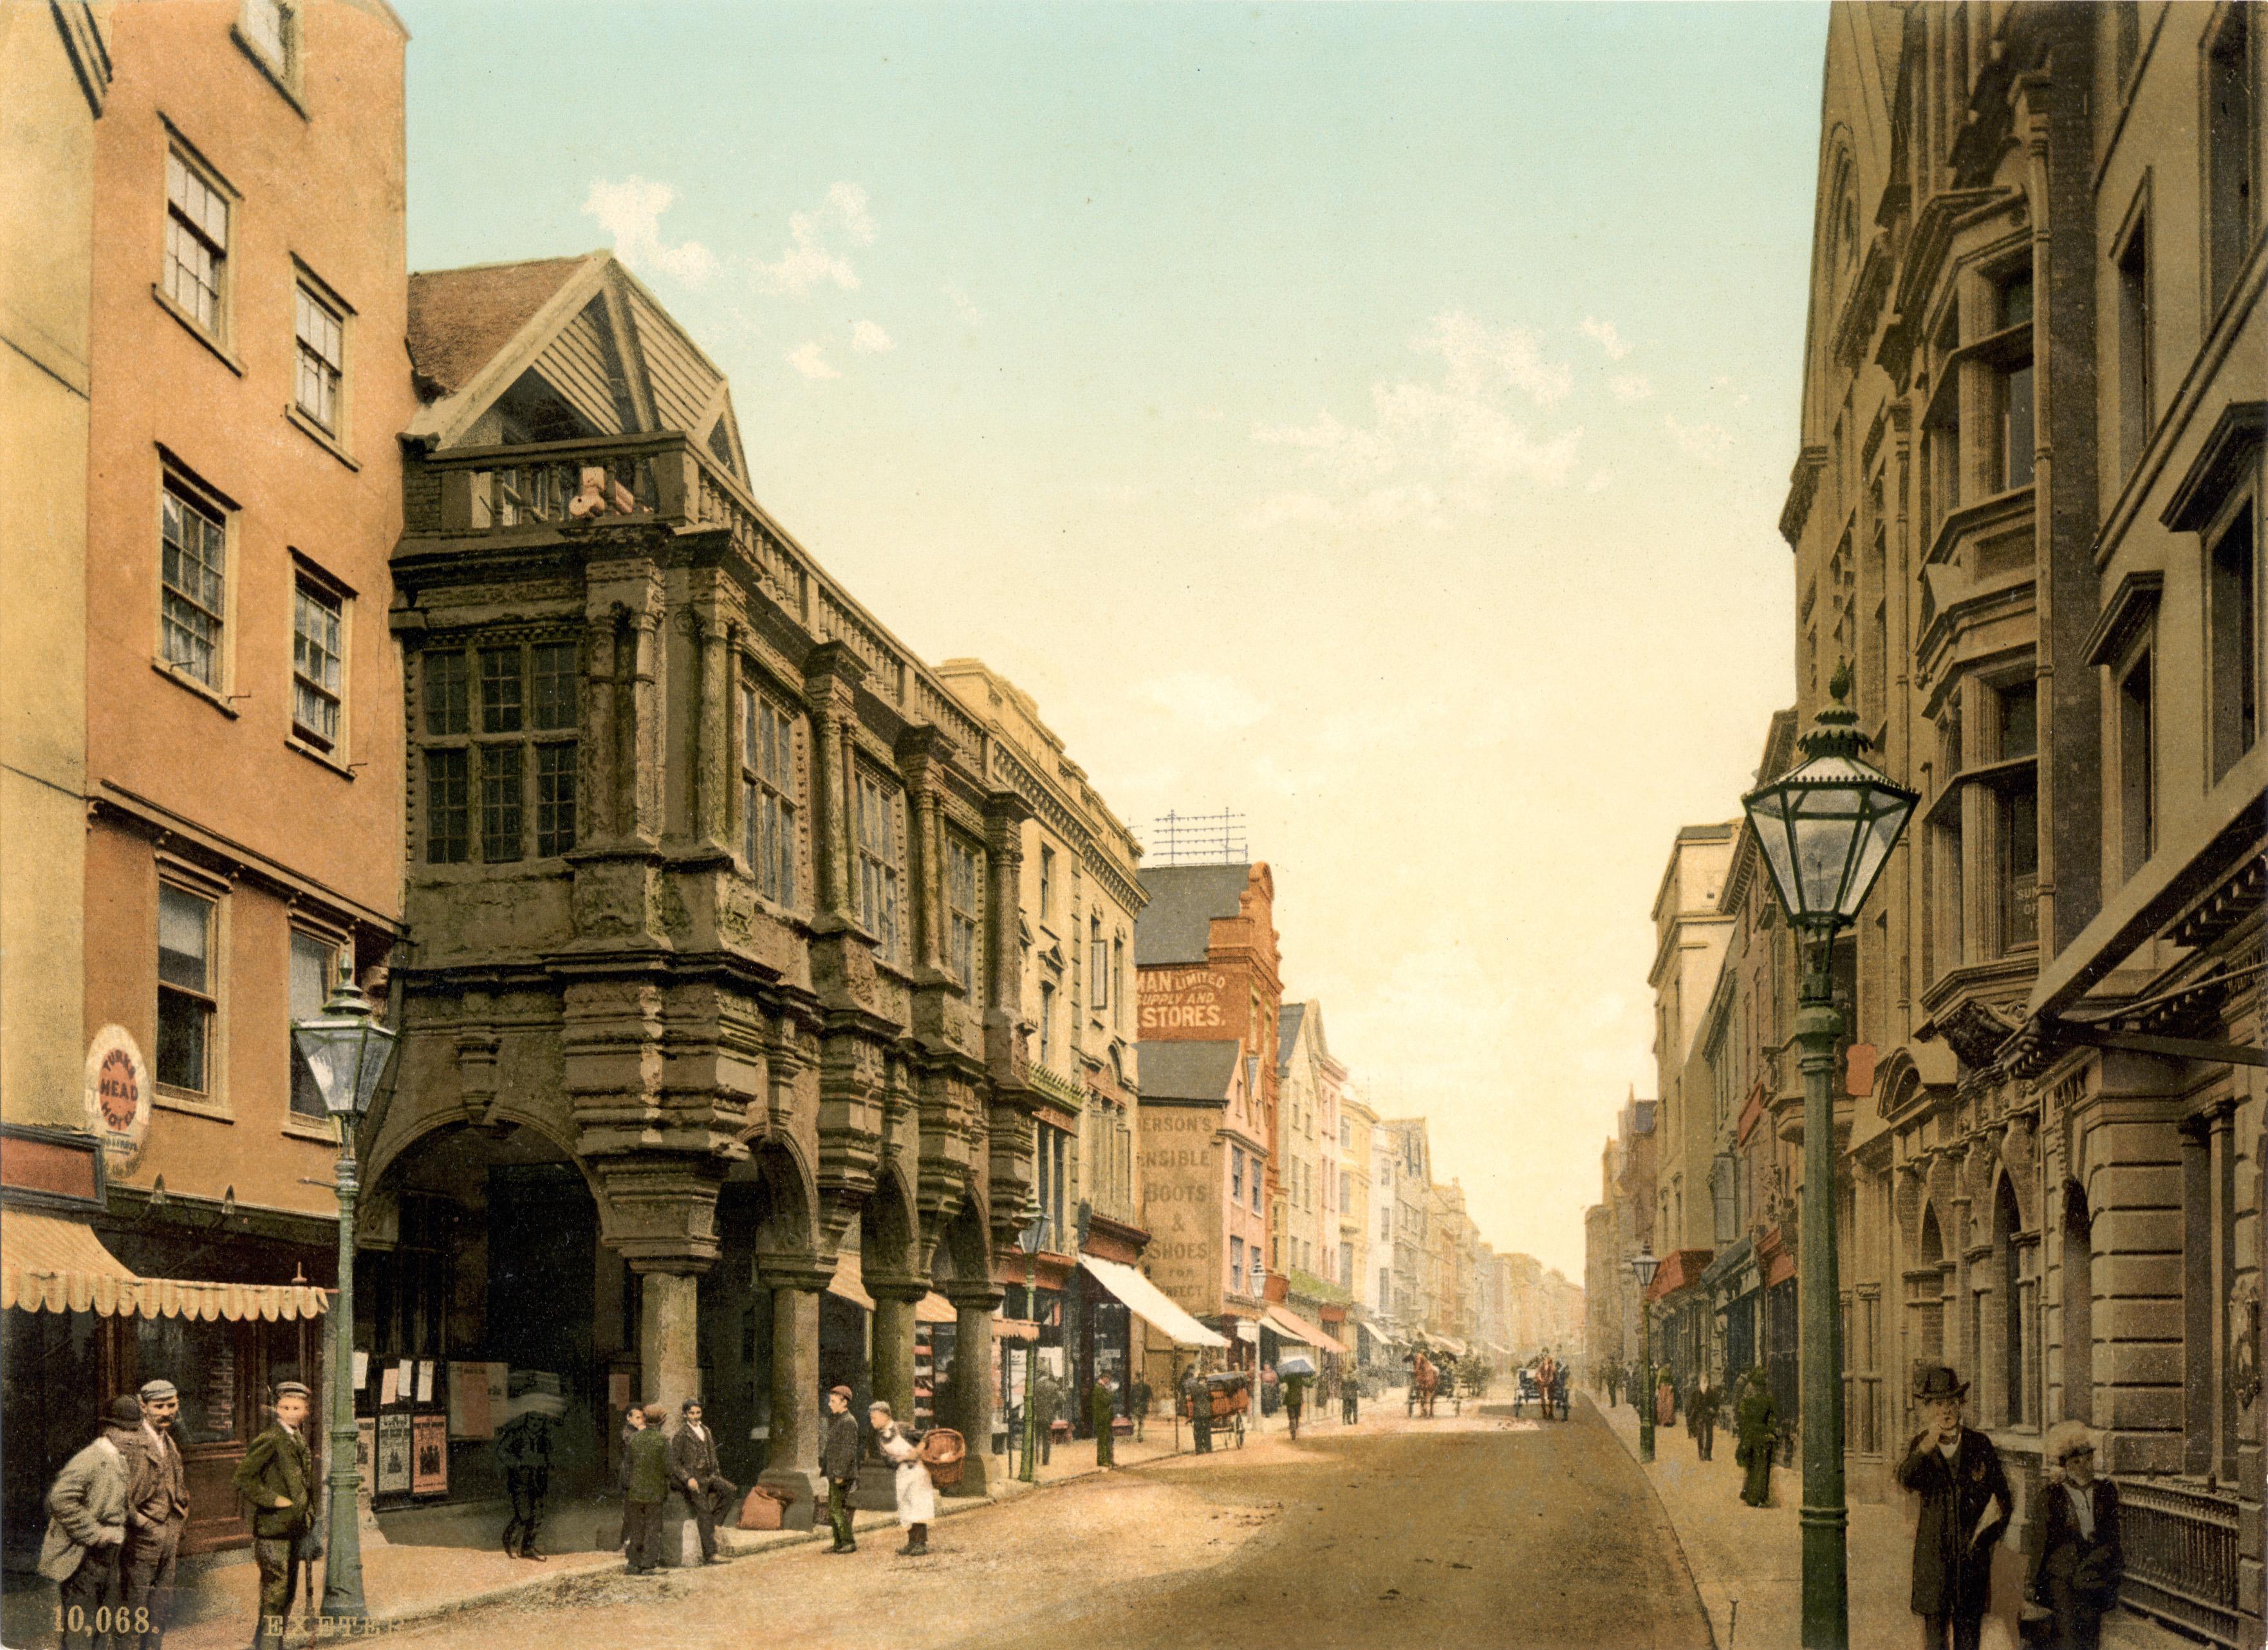 FileHigh Street Exeter England Ca 1895